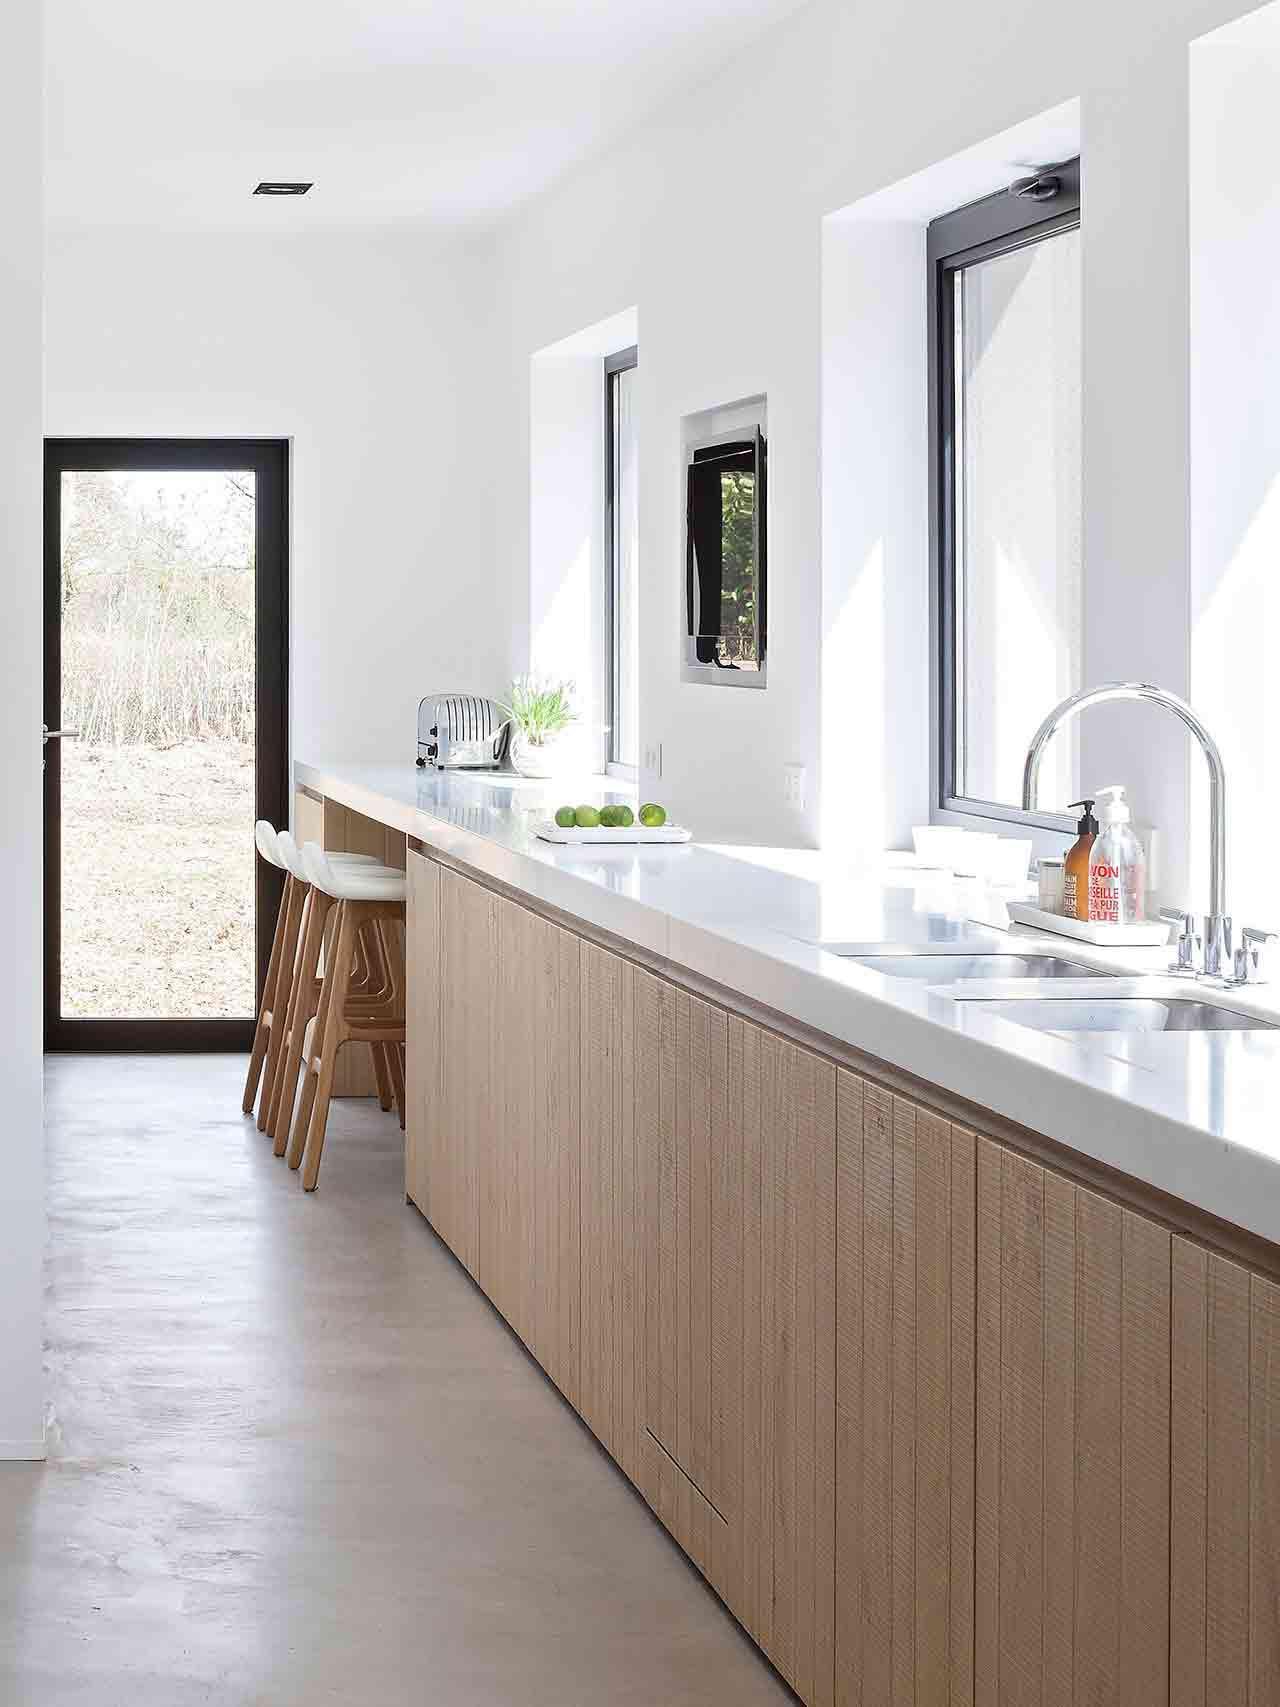 Dekeyzer-hedendaagse-keuken-fineer-corian-2.jpg